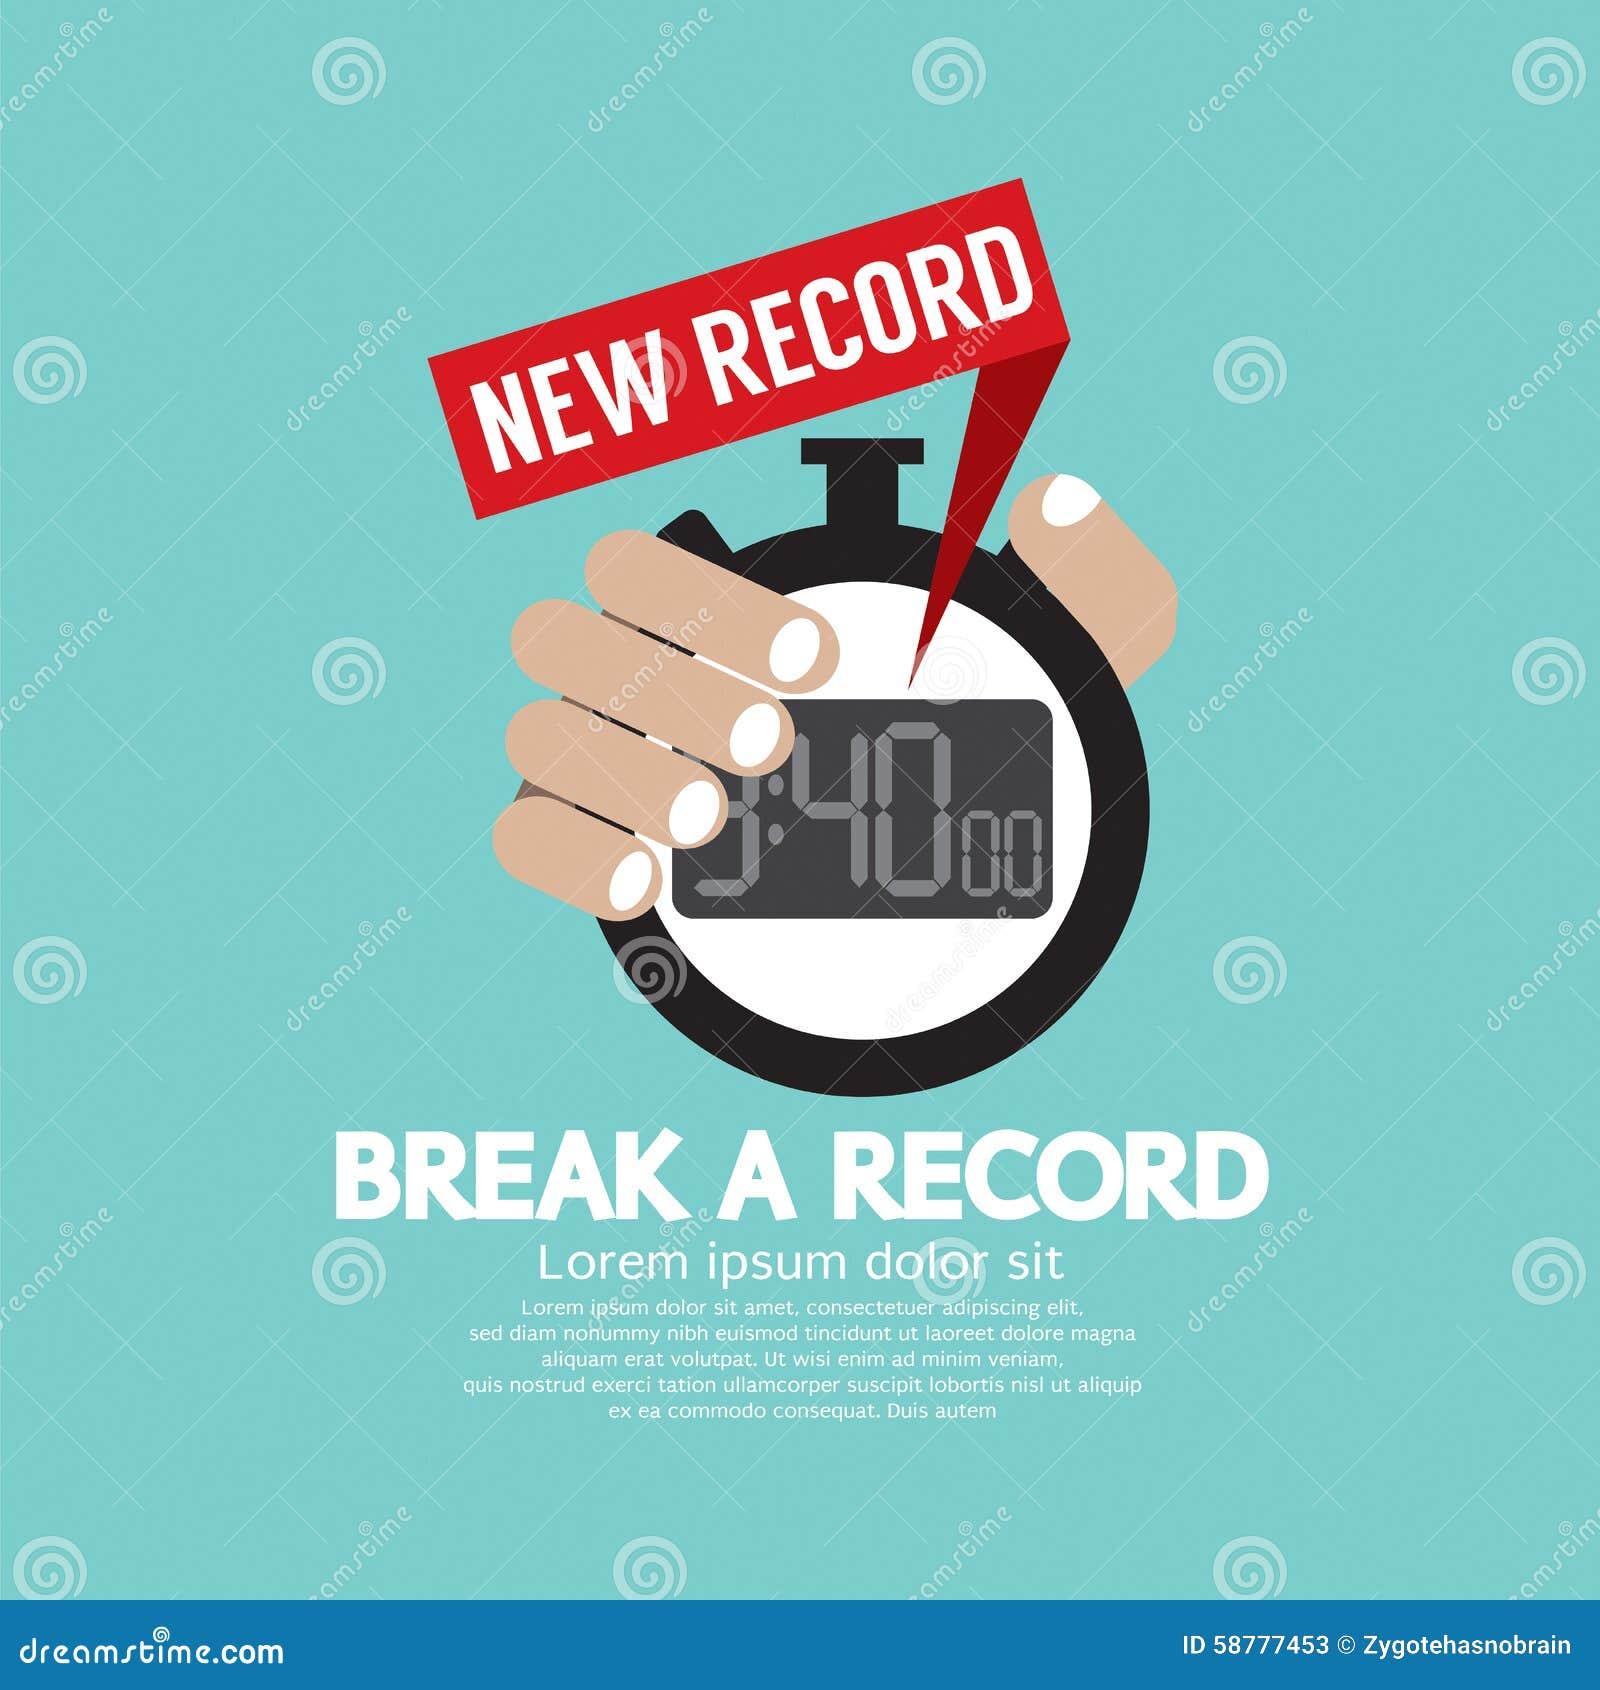 records break by messina - photo#1